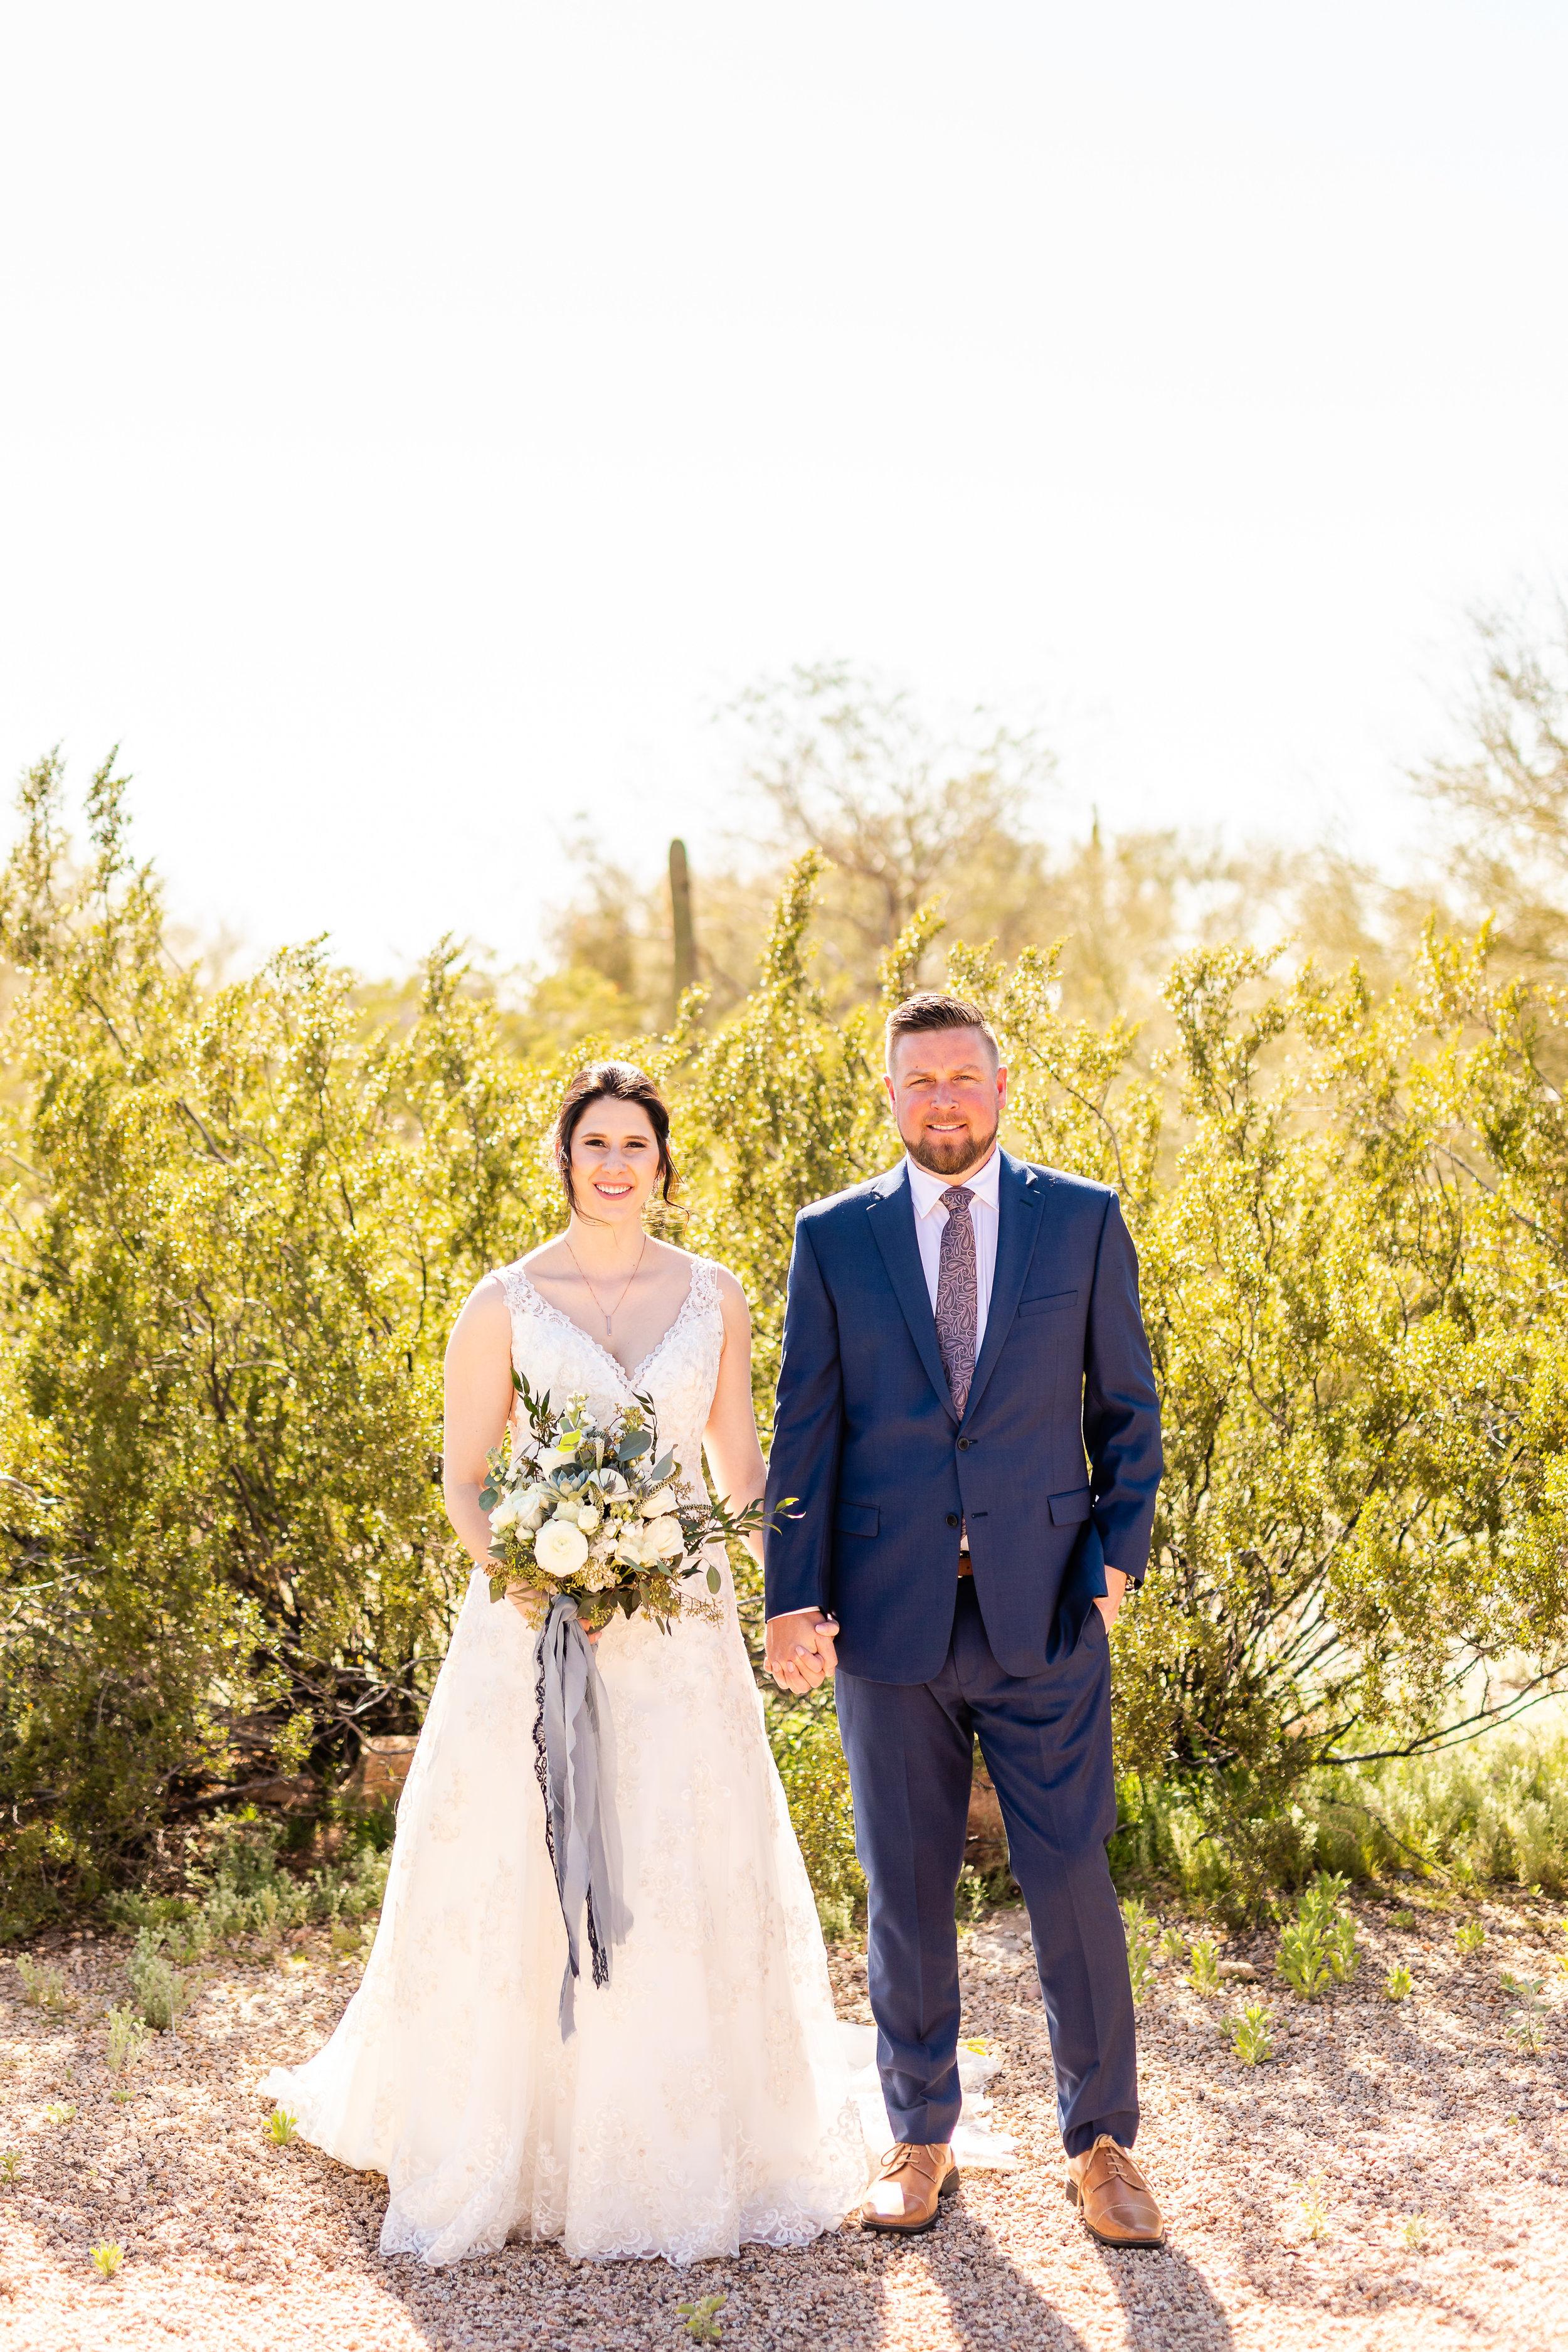 Jordan + Brent - Wedding - Mar2019 - Lunabear Studios-186.jpg